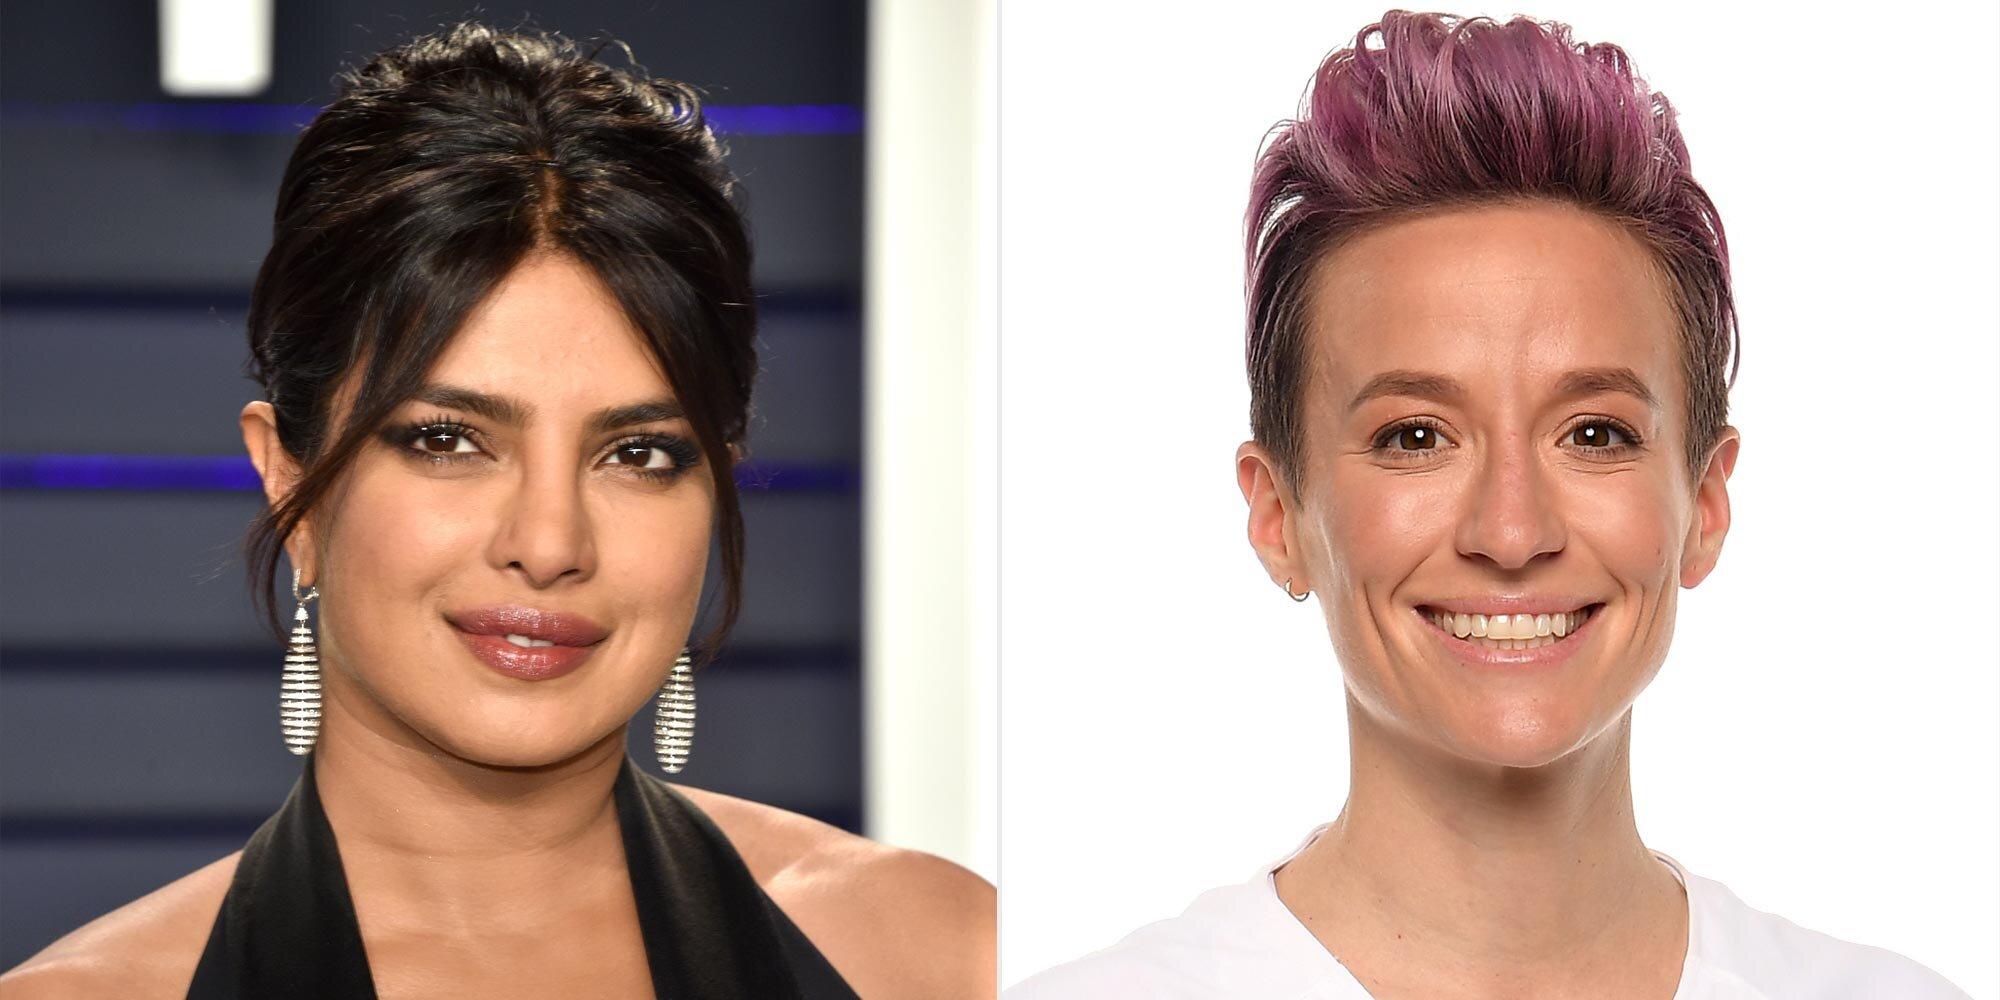 Social media intensely reacts to Victoria's Secret nixing Angels for Priyanka Chopra and Megan Rapinoe